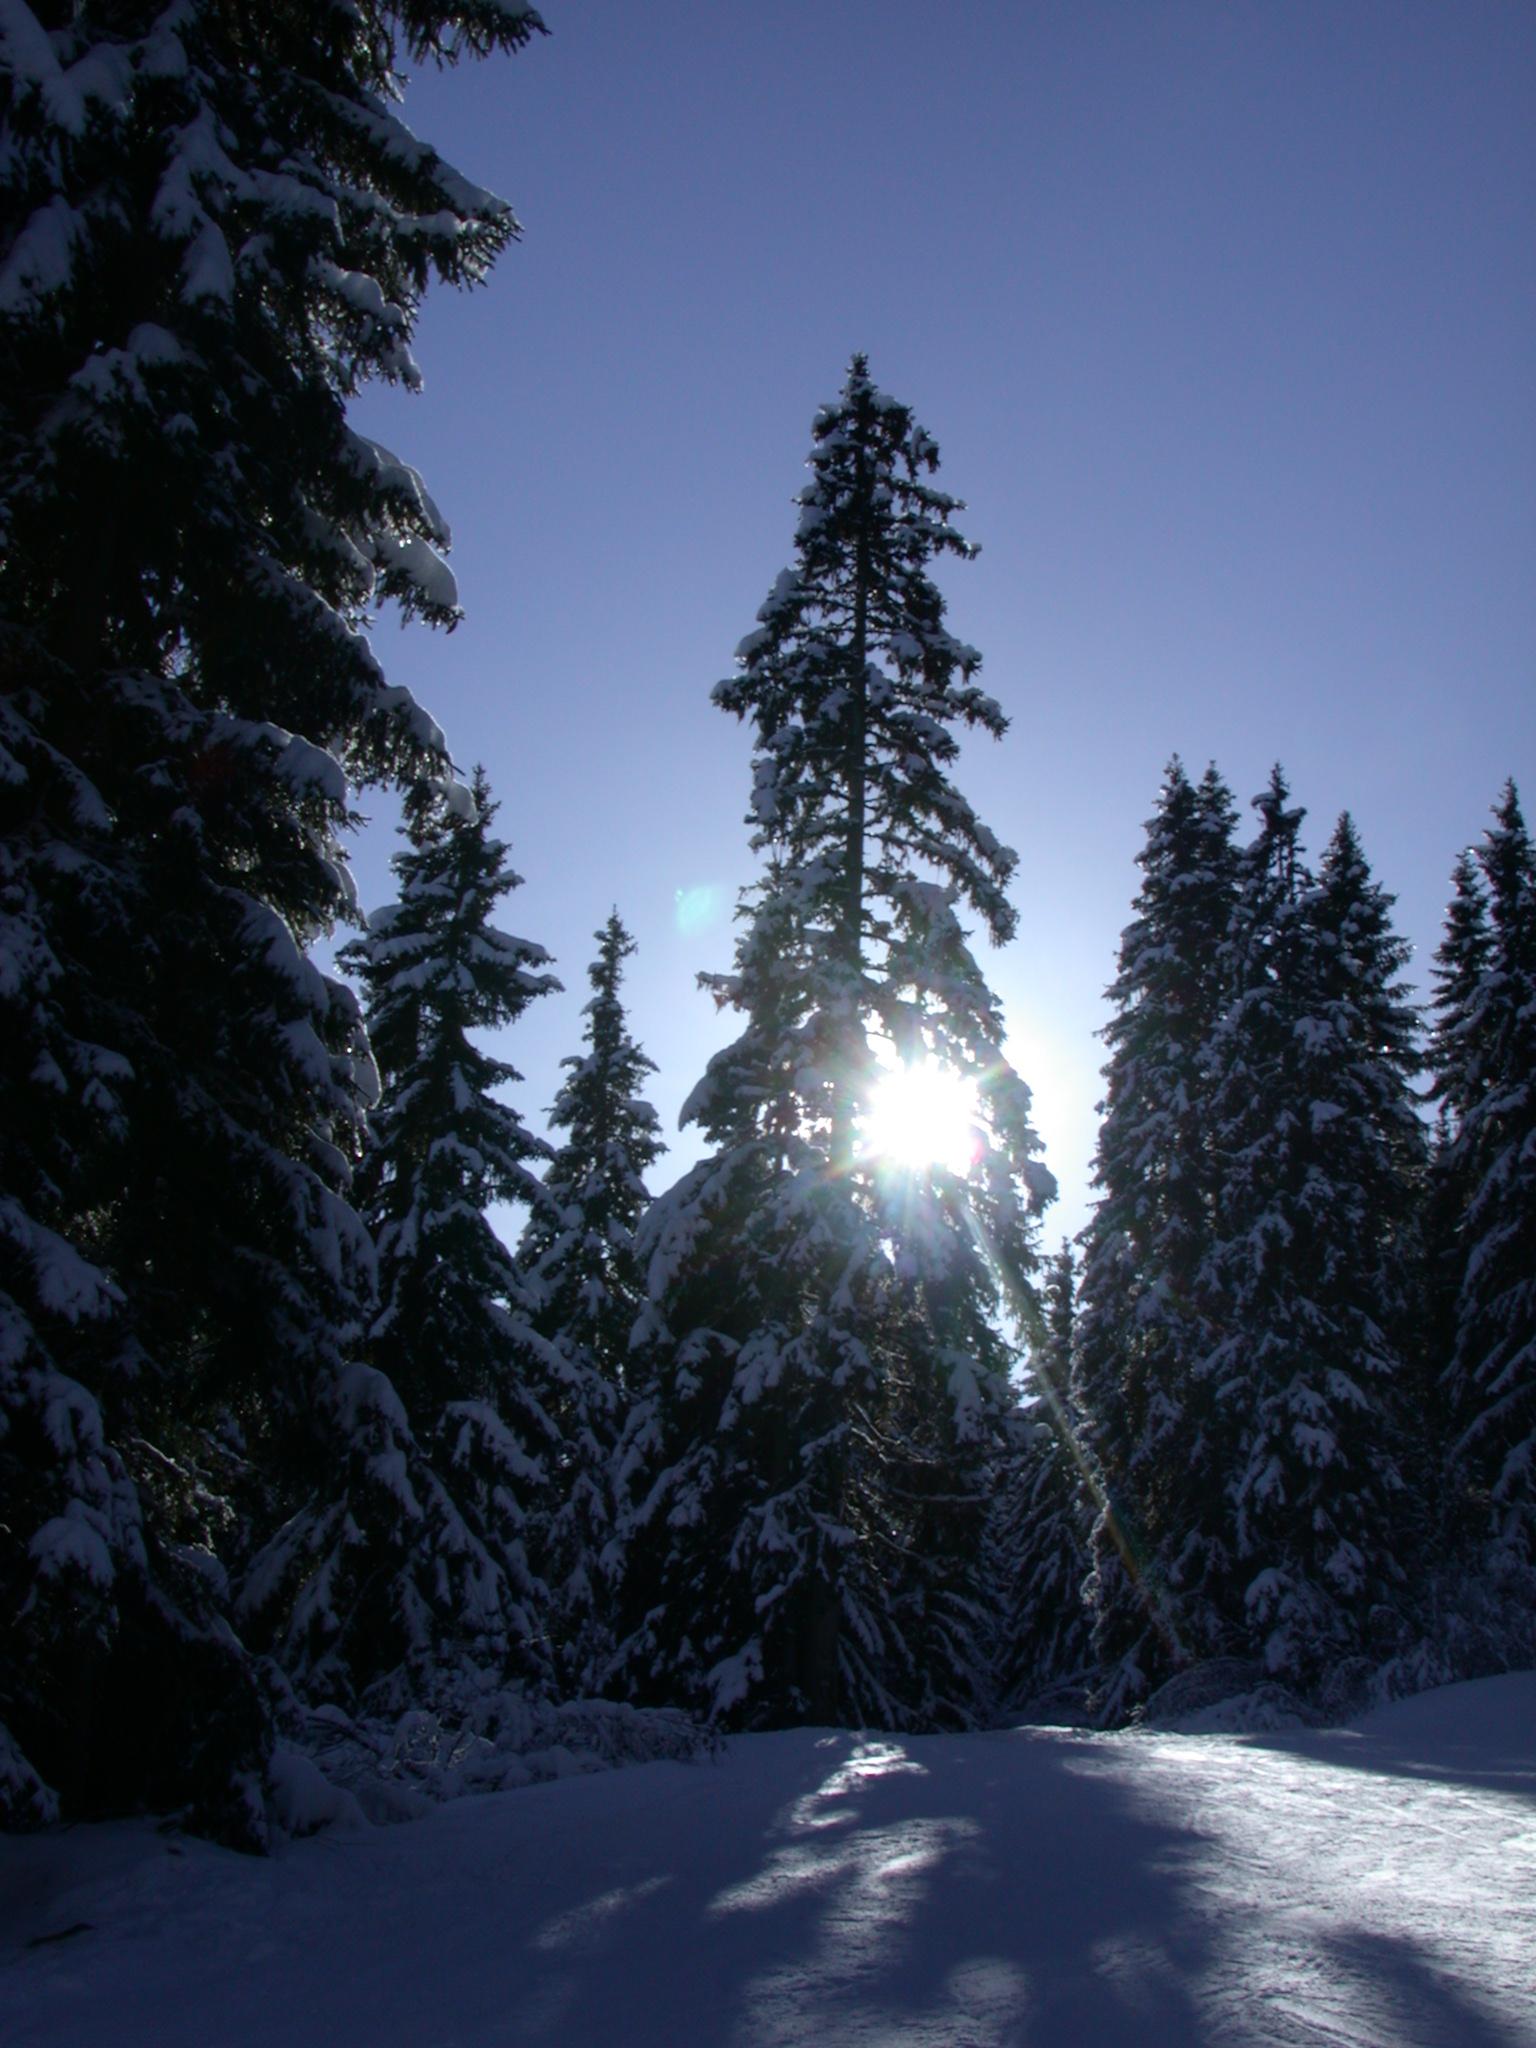 pines snow sky cold winter sun